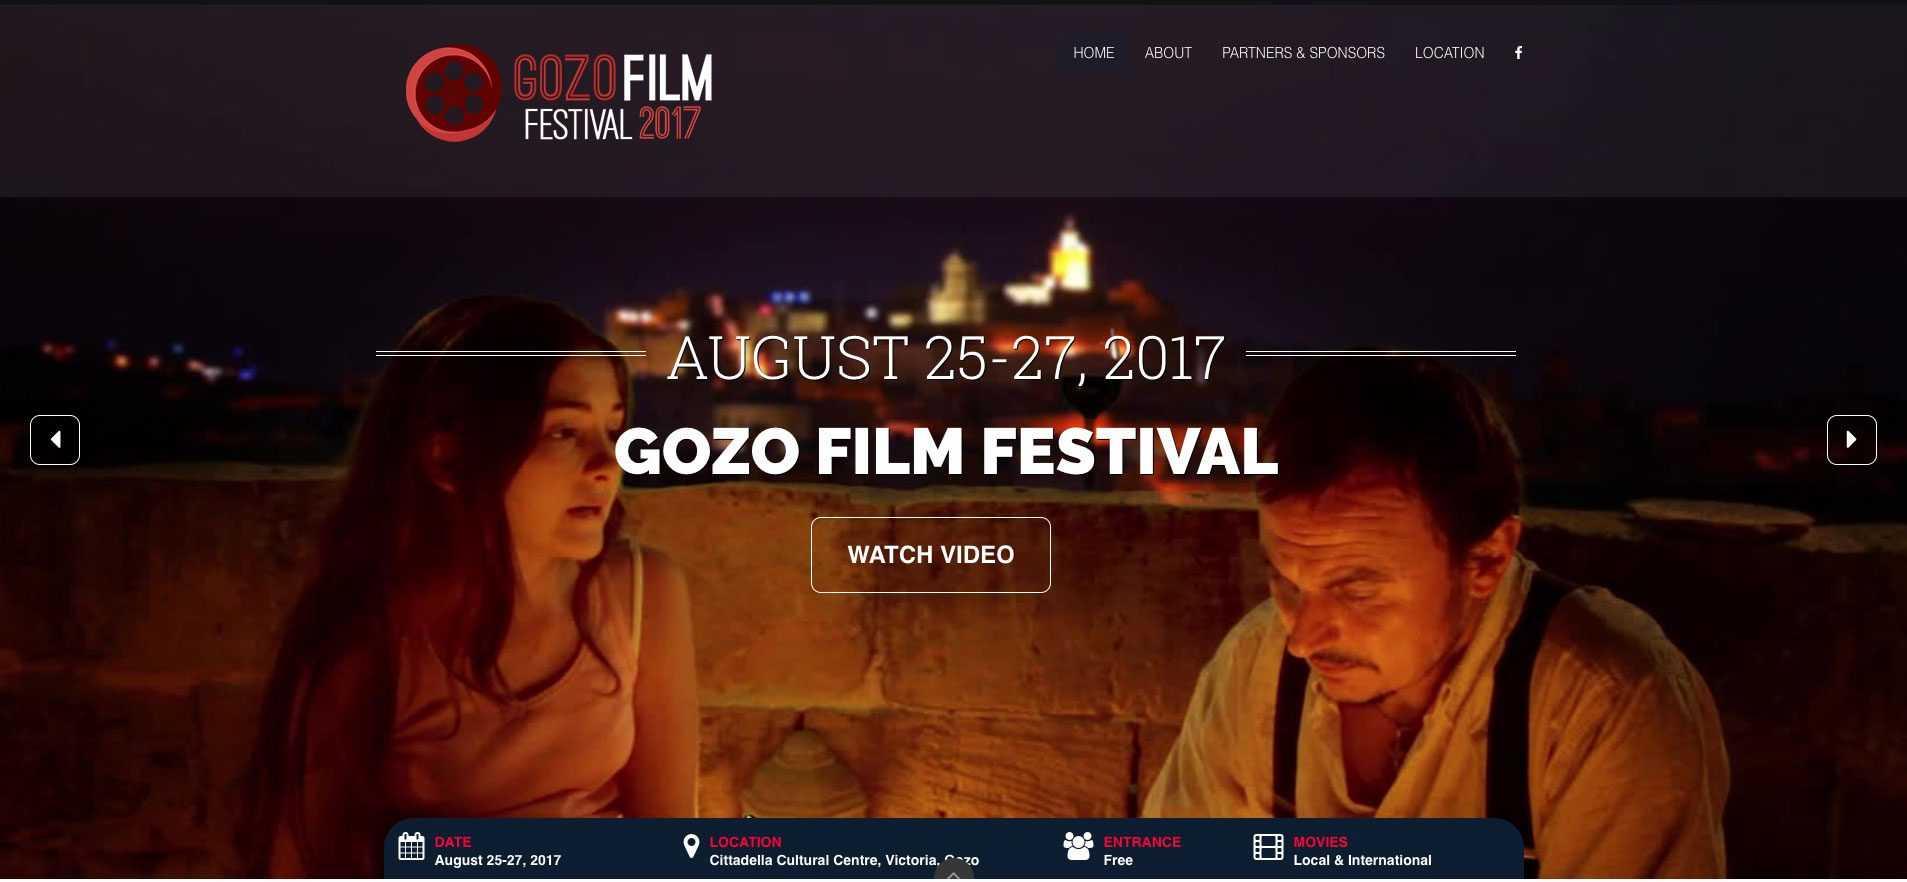 Gozo Film Festival image